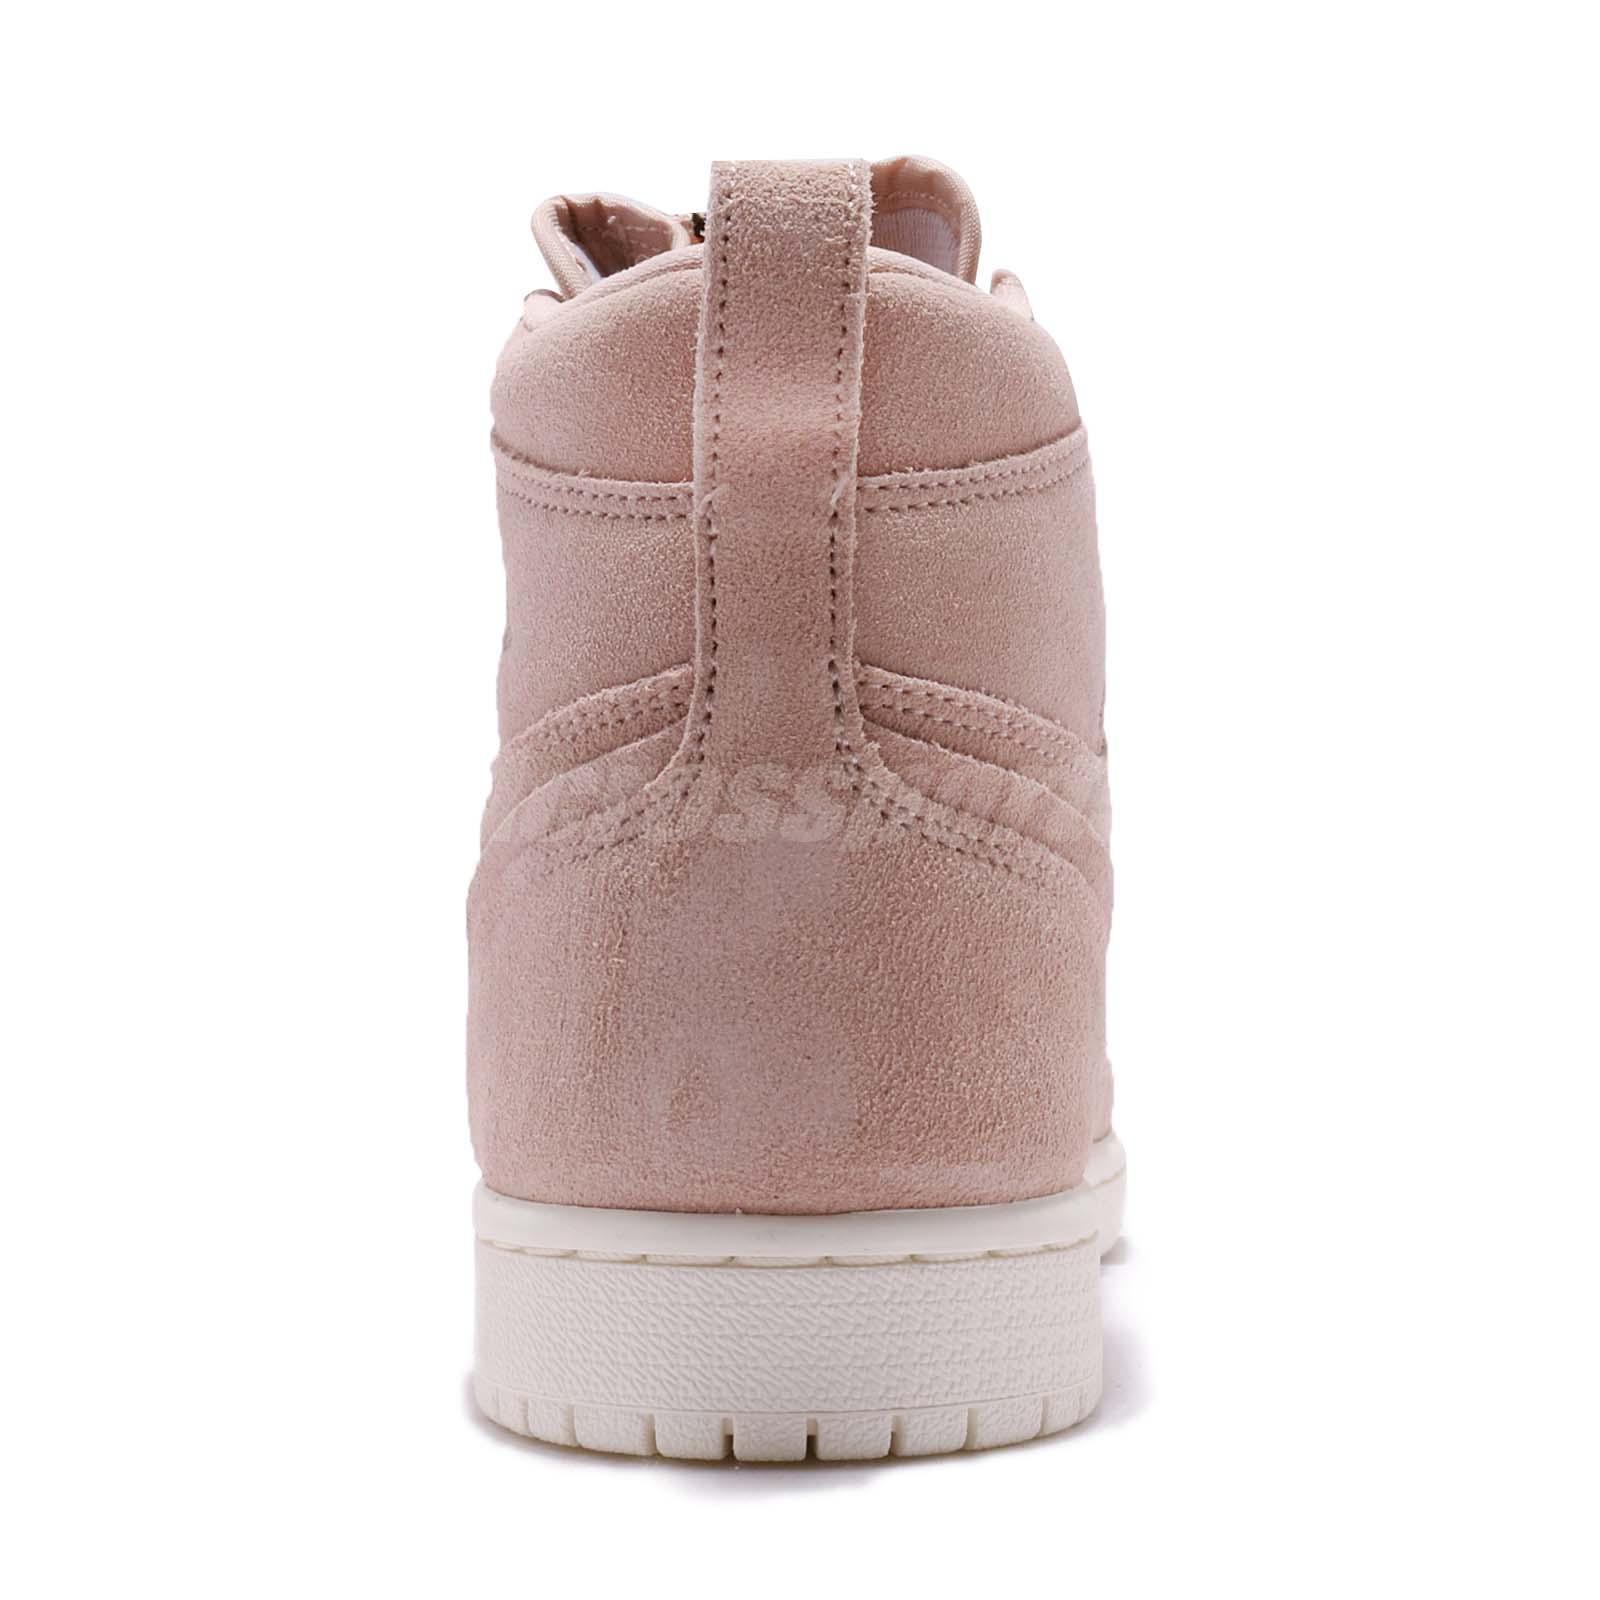 84e60159ed86 Nike Wmns Air Jordan 1 High Zip I Retro Particle Beige Women Shoes ...